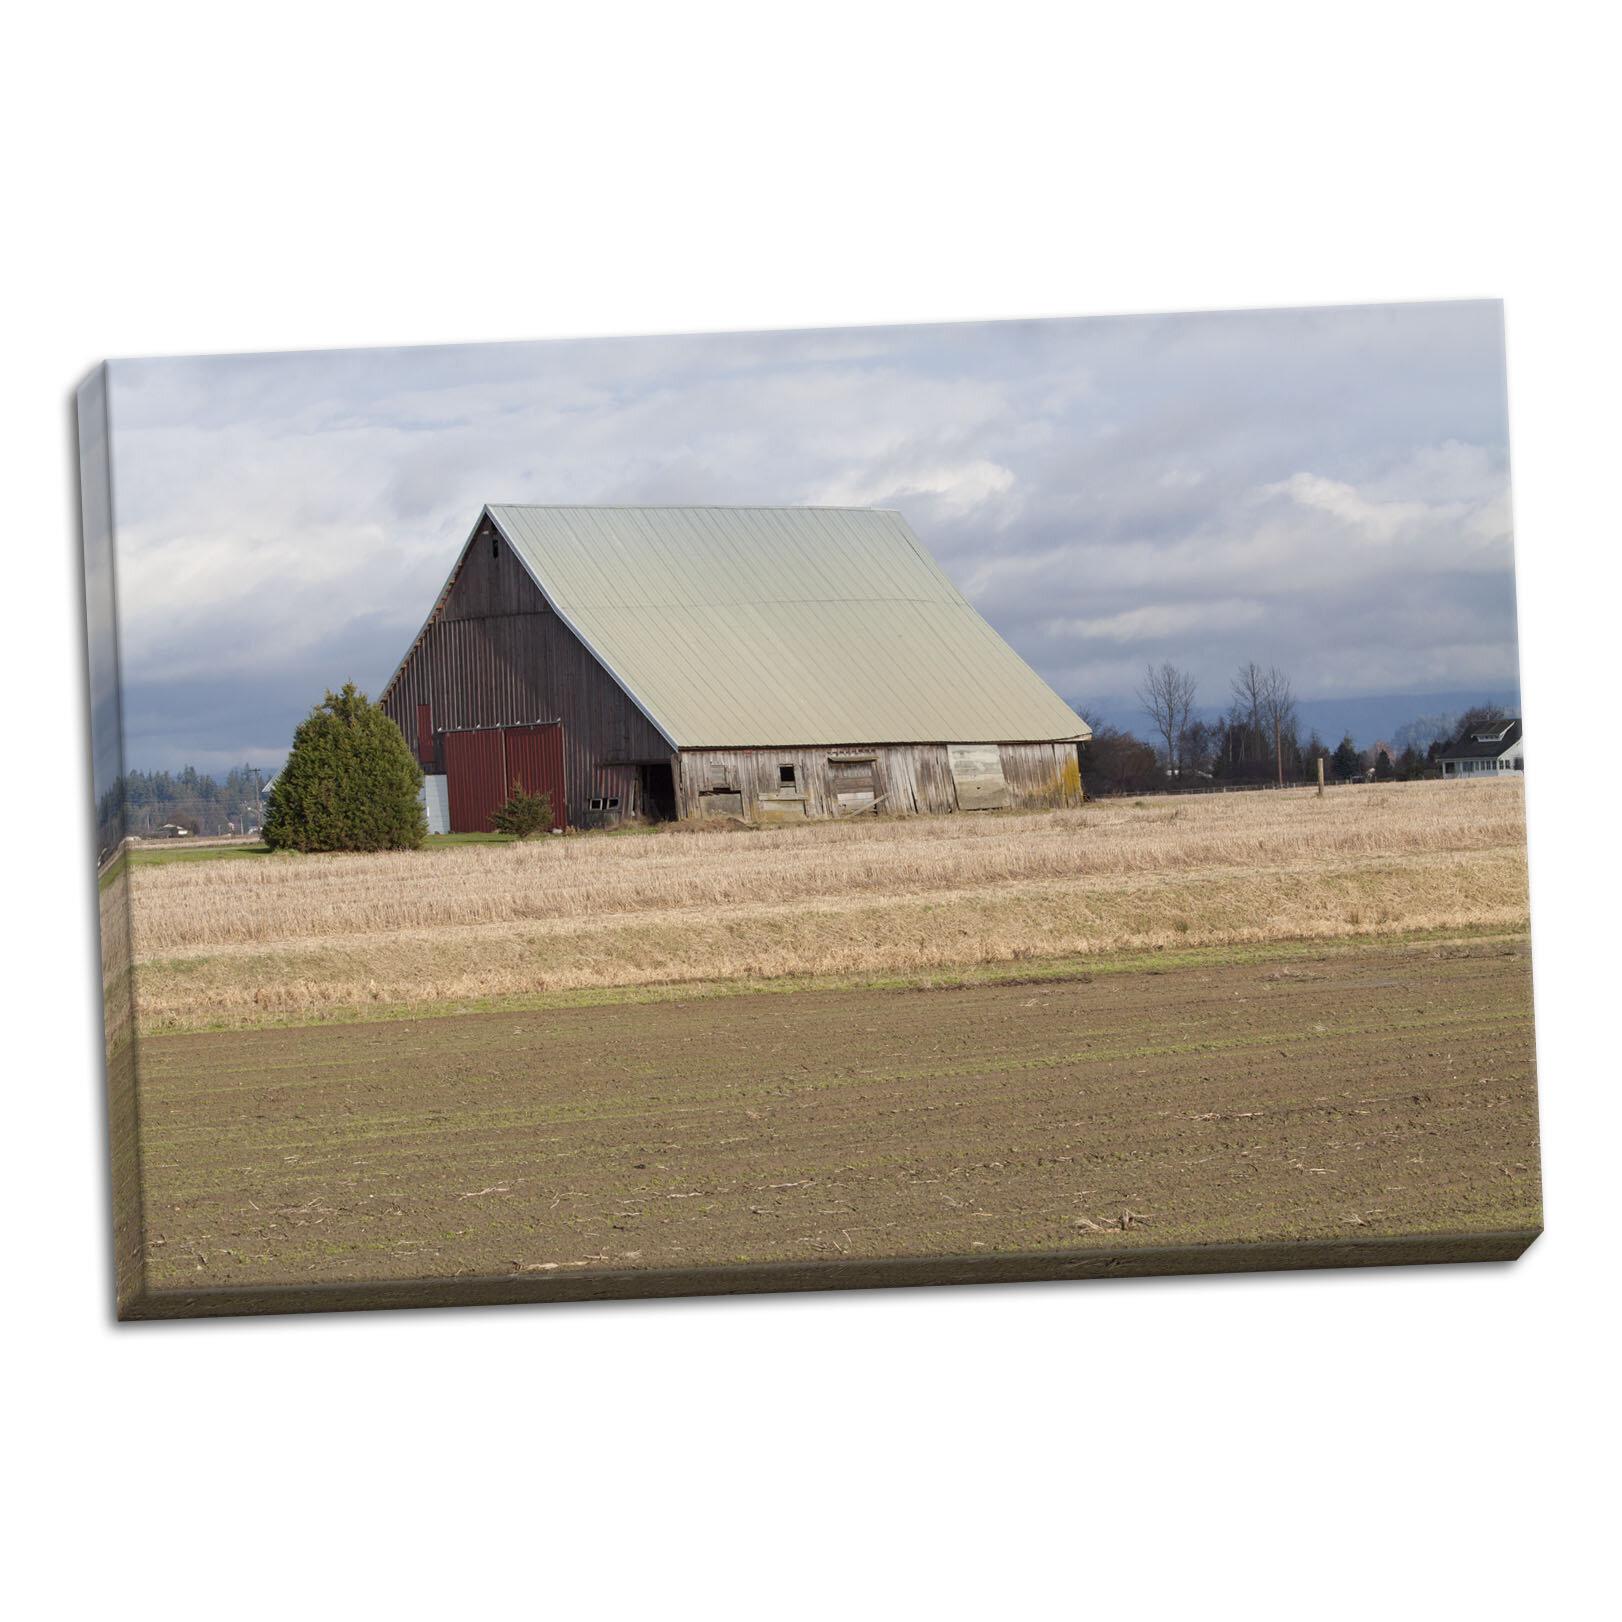 August Grove U0027Red Door Barnu0027 Photographic Print On Wrapped Canvas | Wayfair